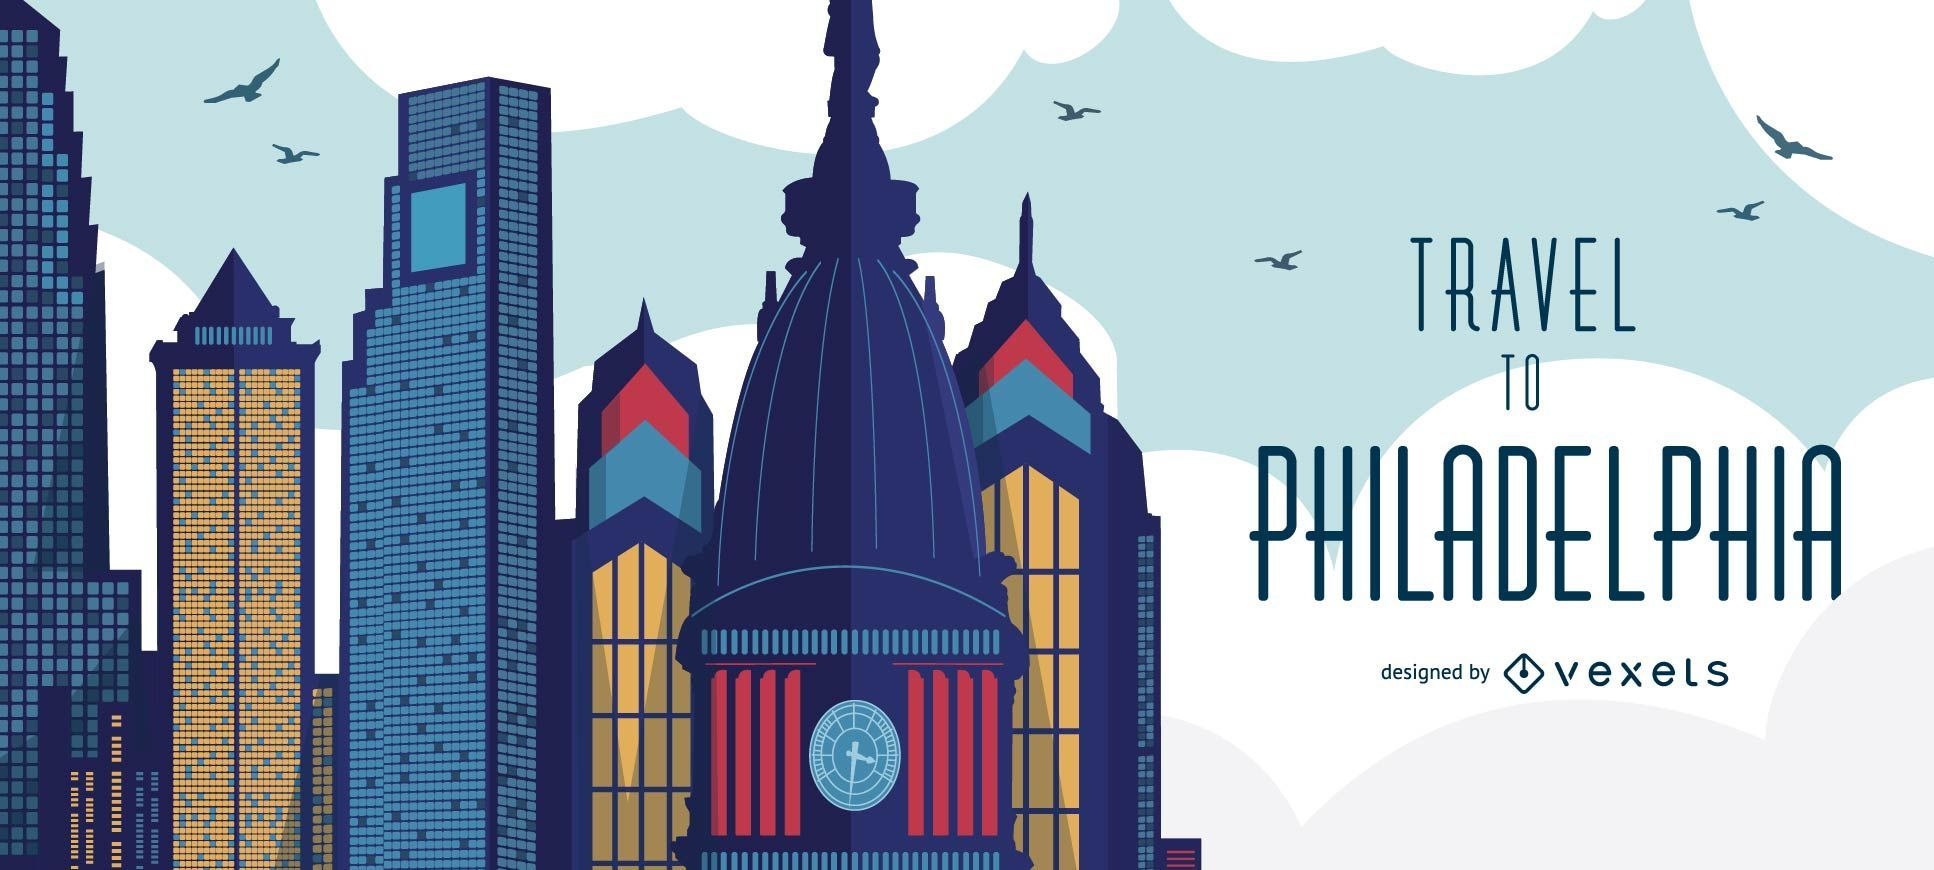 Travel to Philadelphia skyline